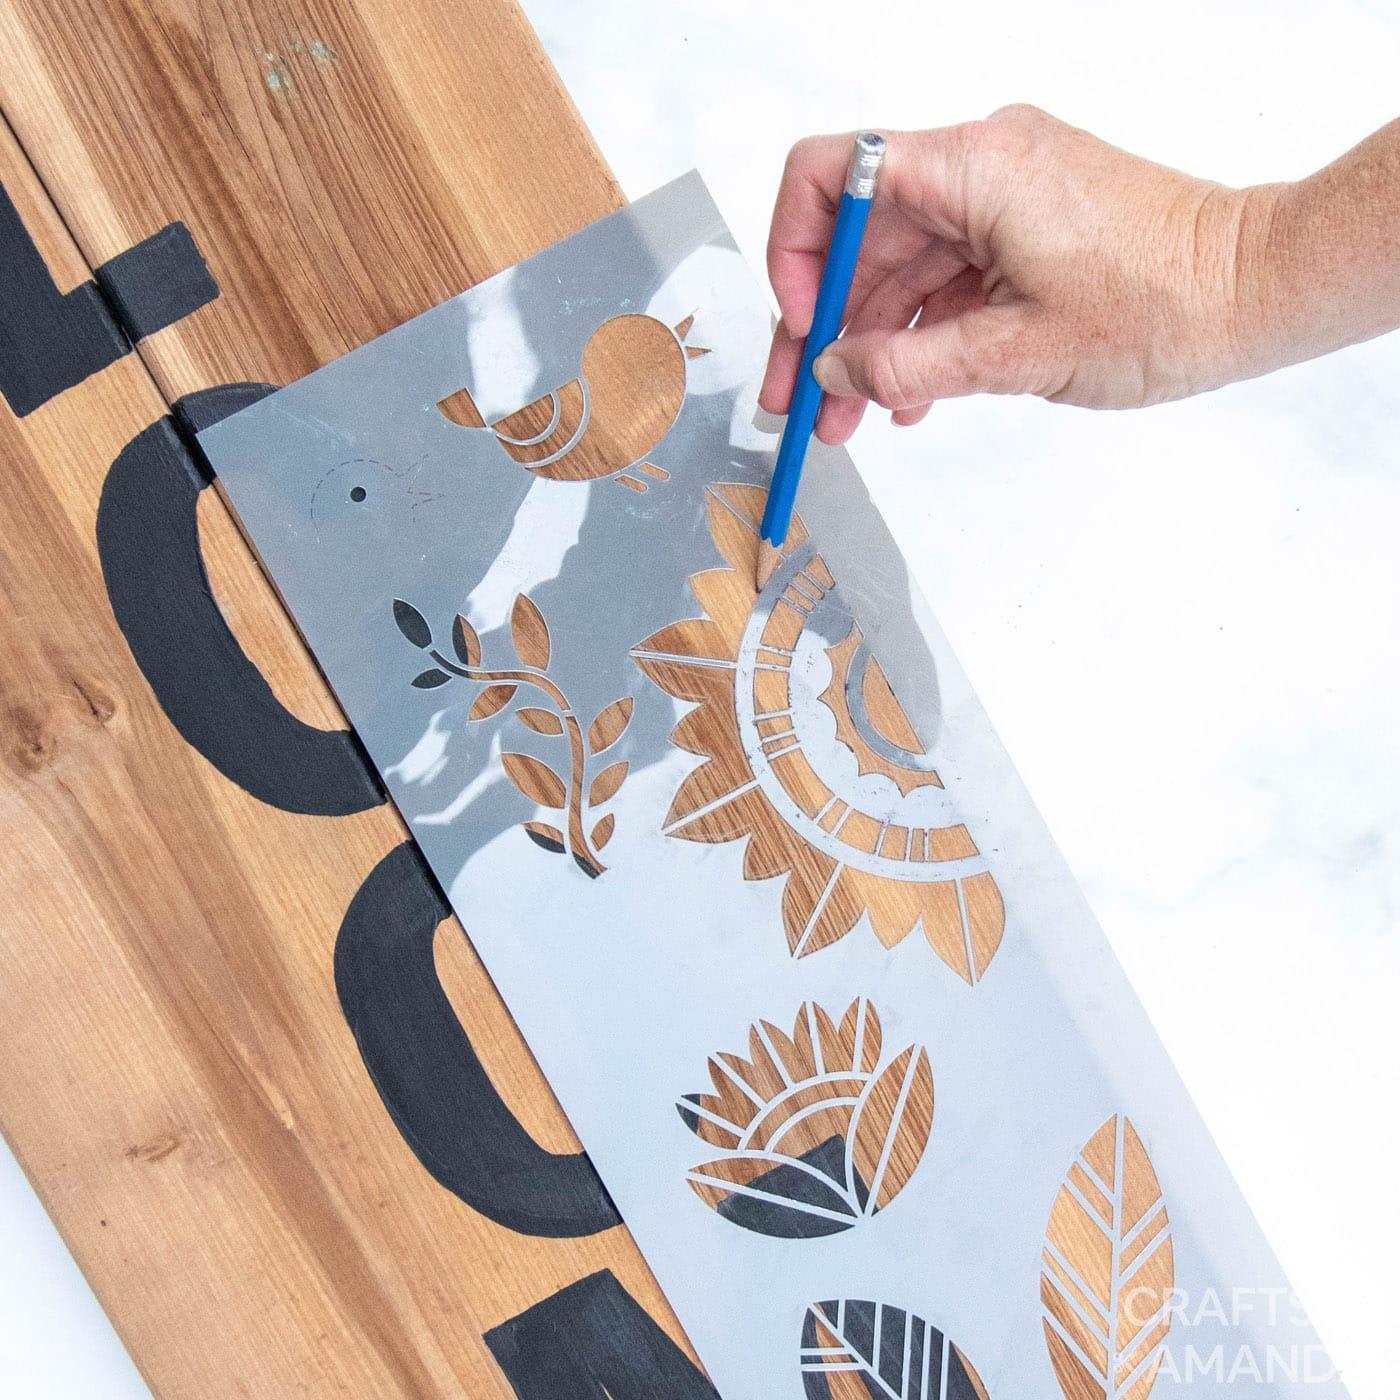 tracing stencil onto wooden board